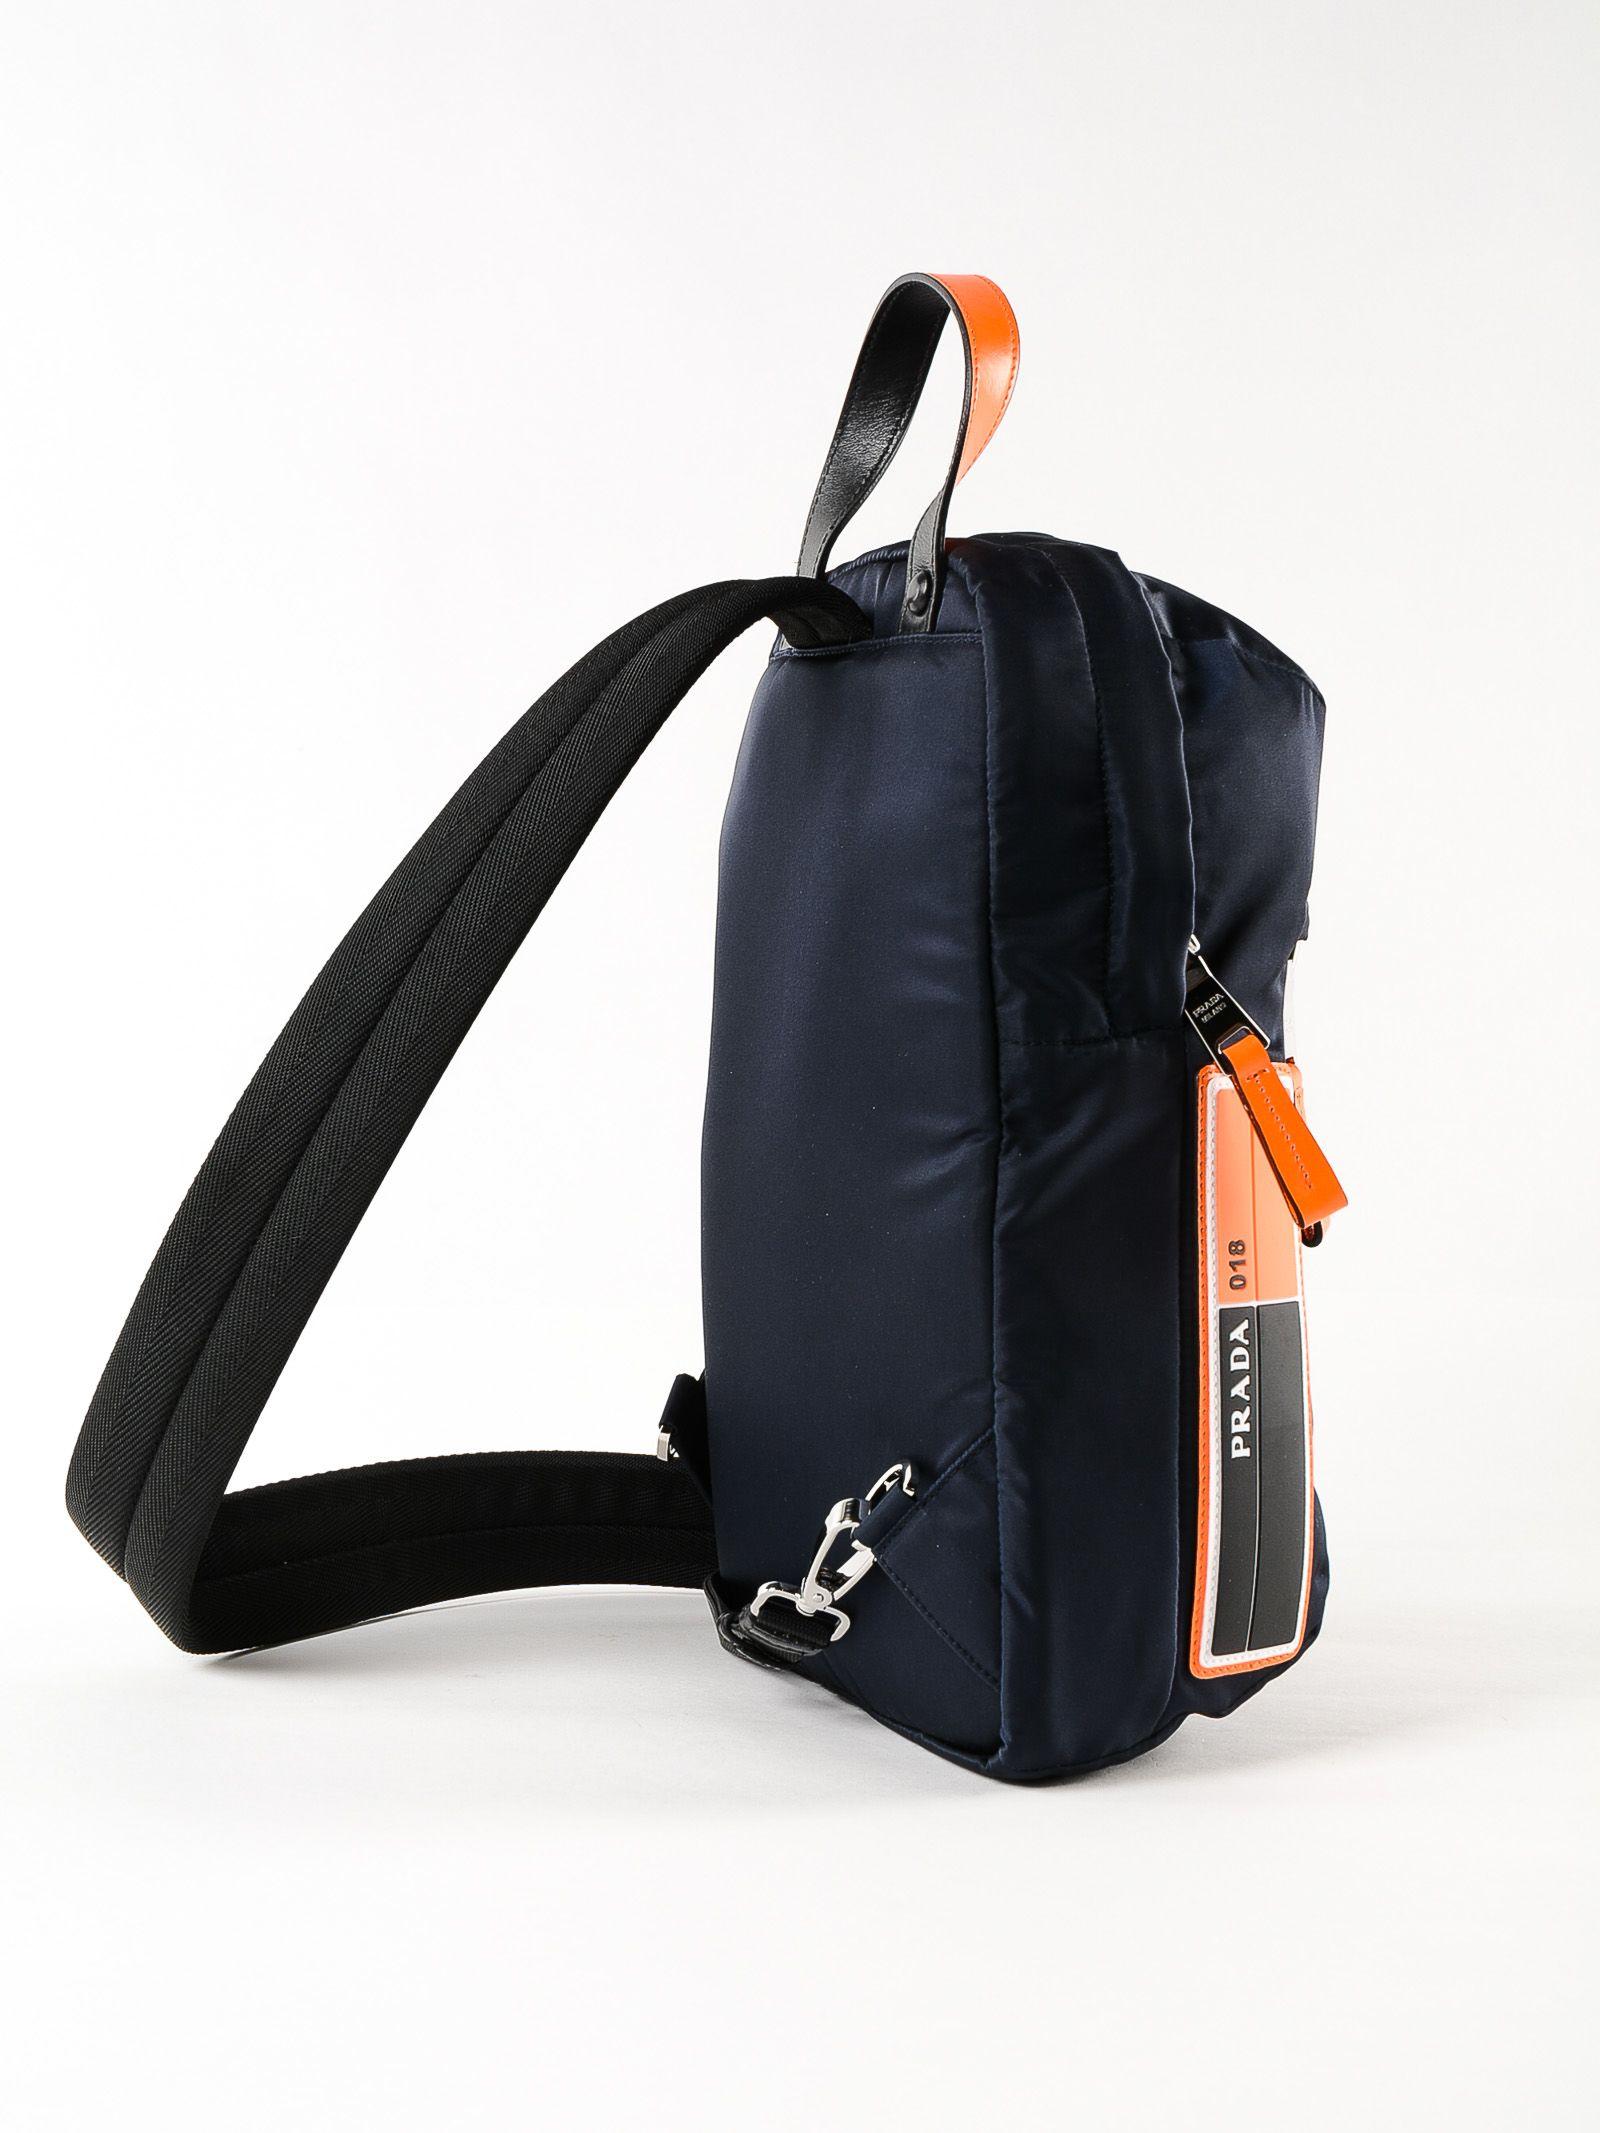 4459c9d29bcb Prada Prada One-shoulder Backpack - Xvt Blu/arancio Fluo - 10775201 ...